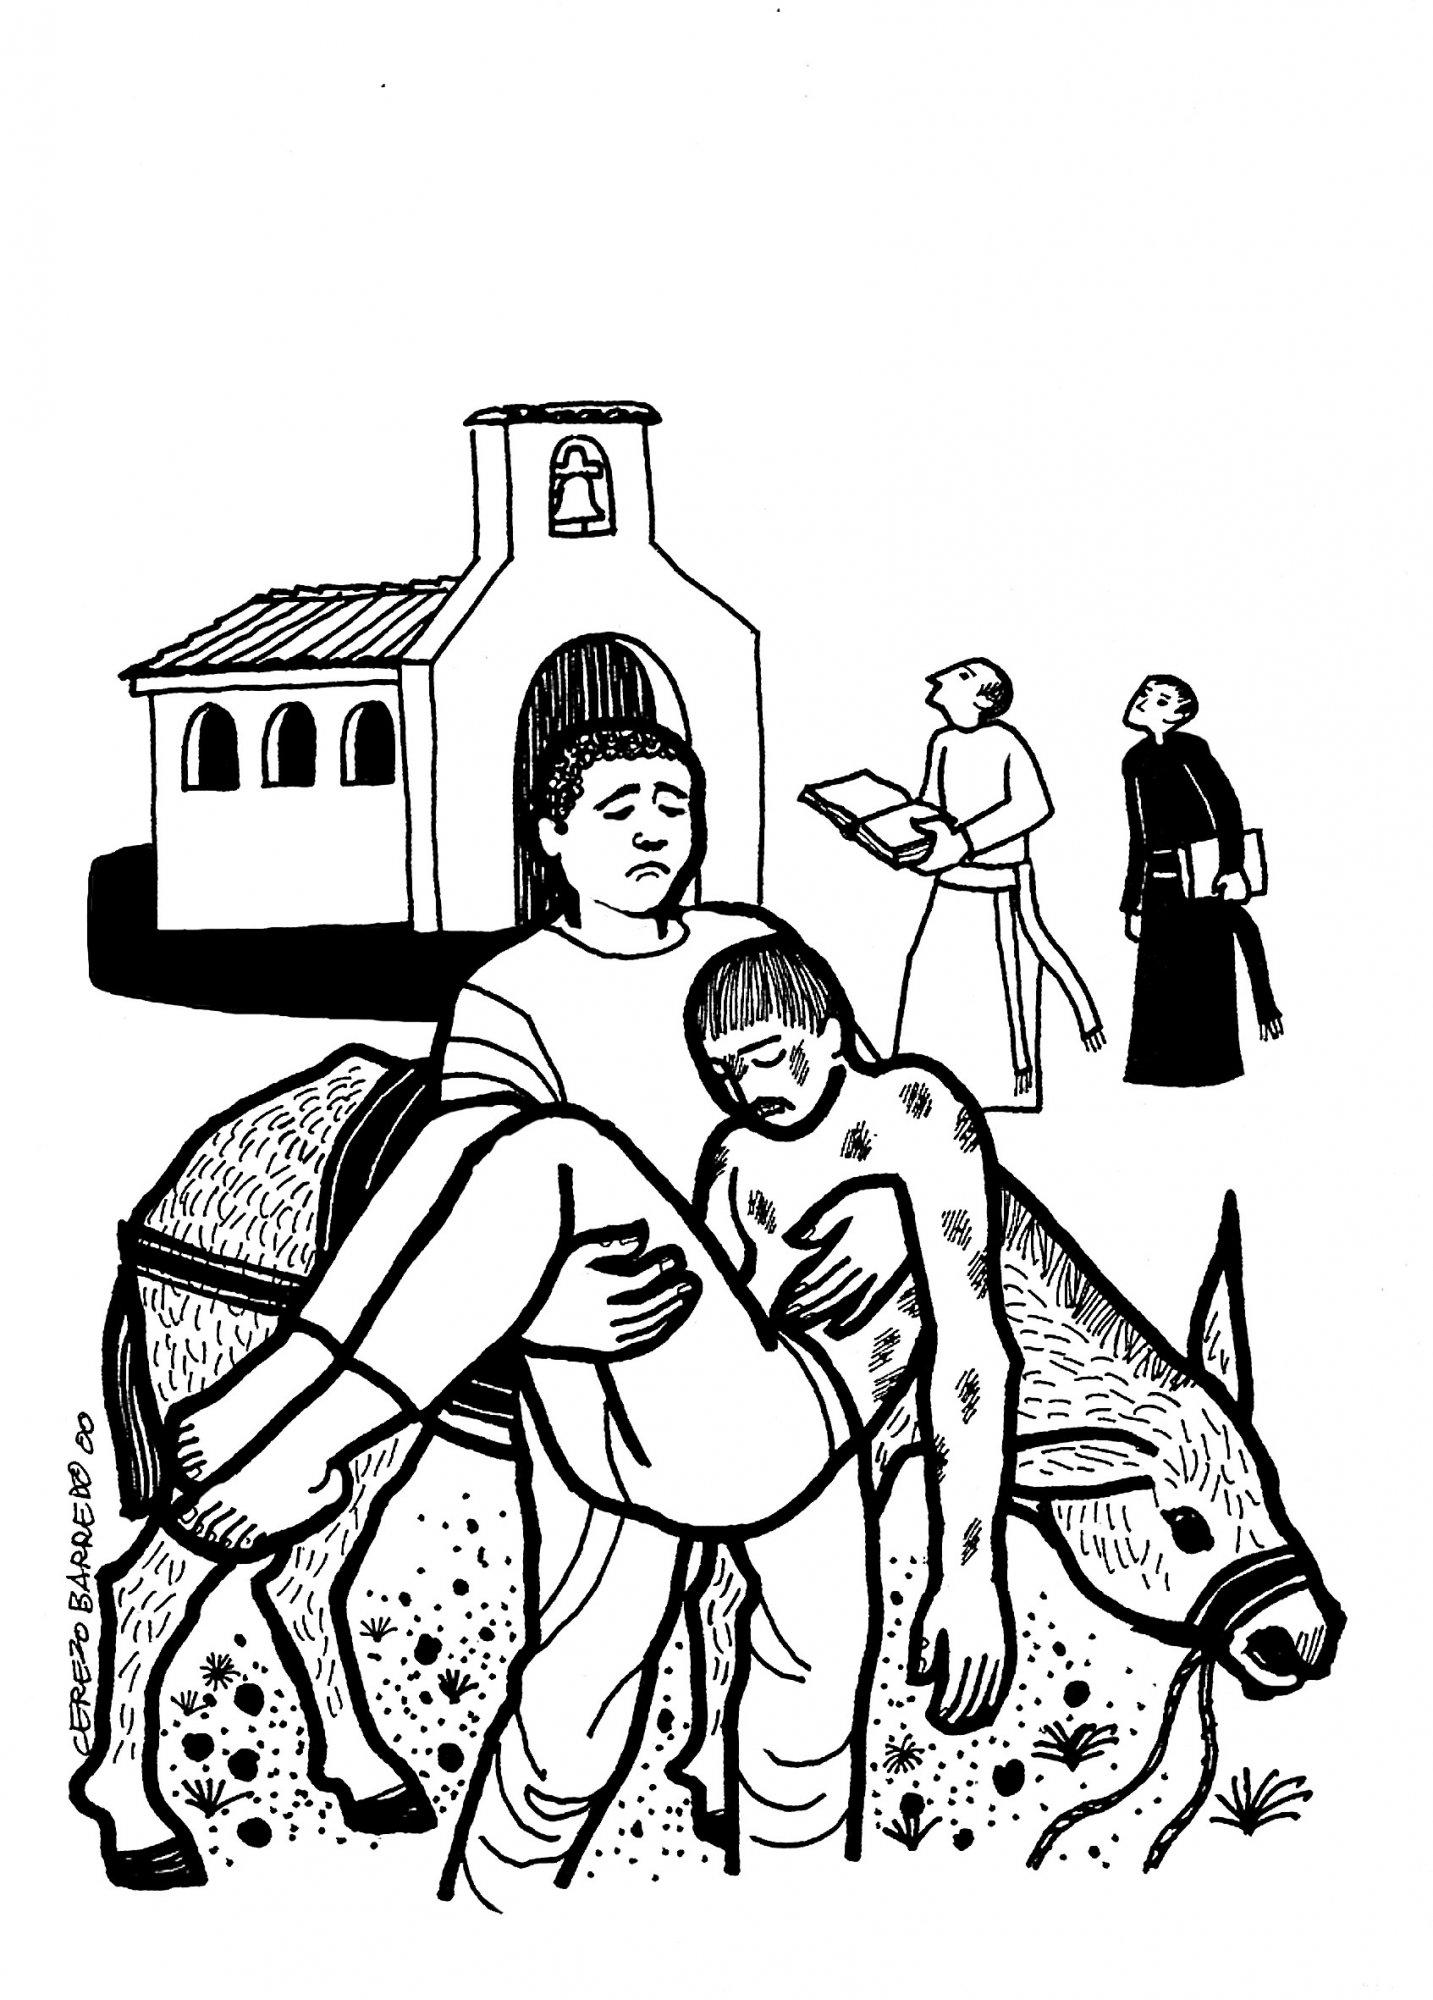 90611-lectura-del-santo-evangelio-segun-san-lucas-10-25-37